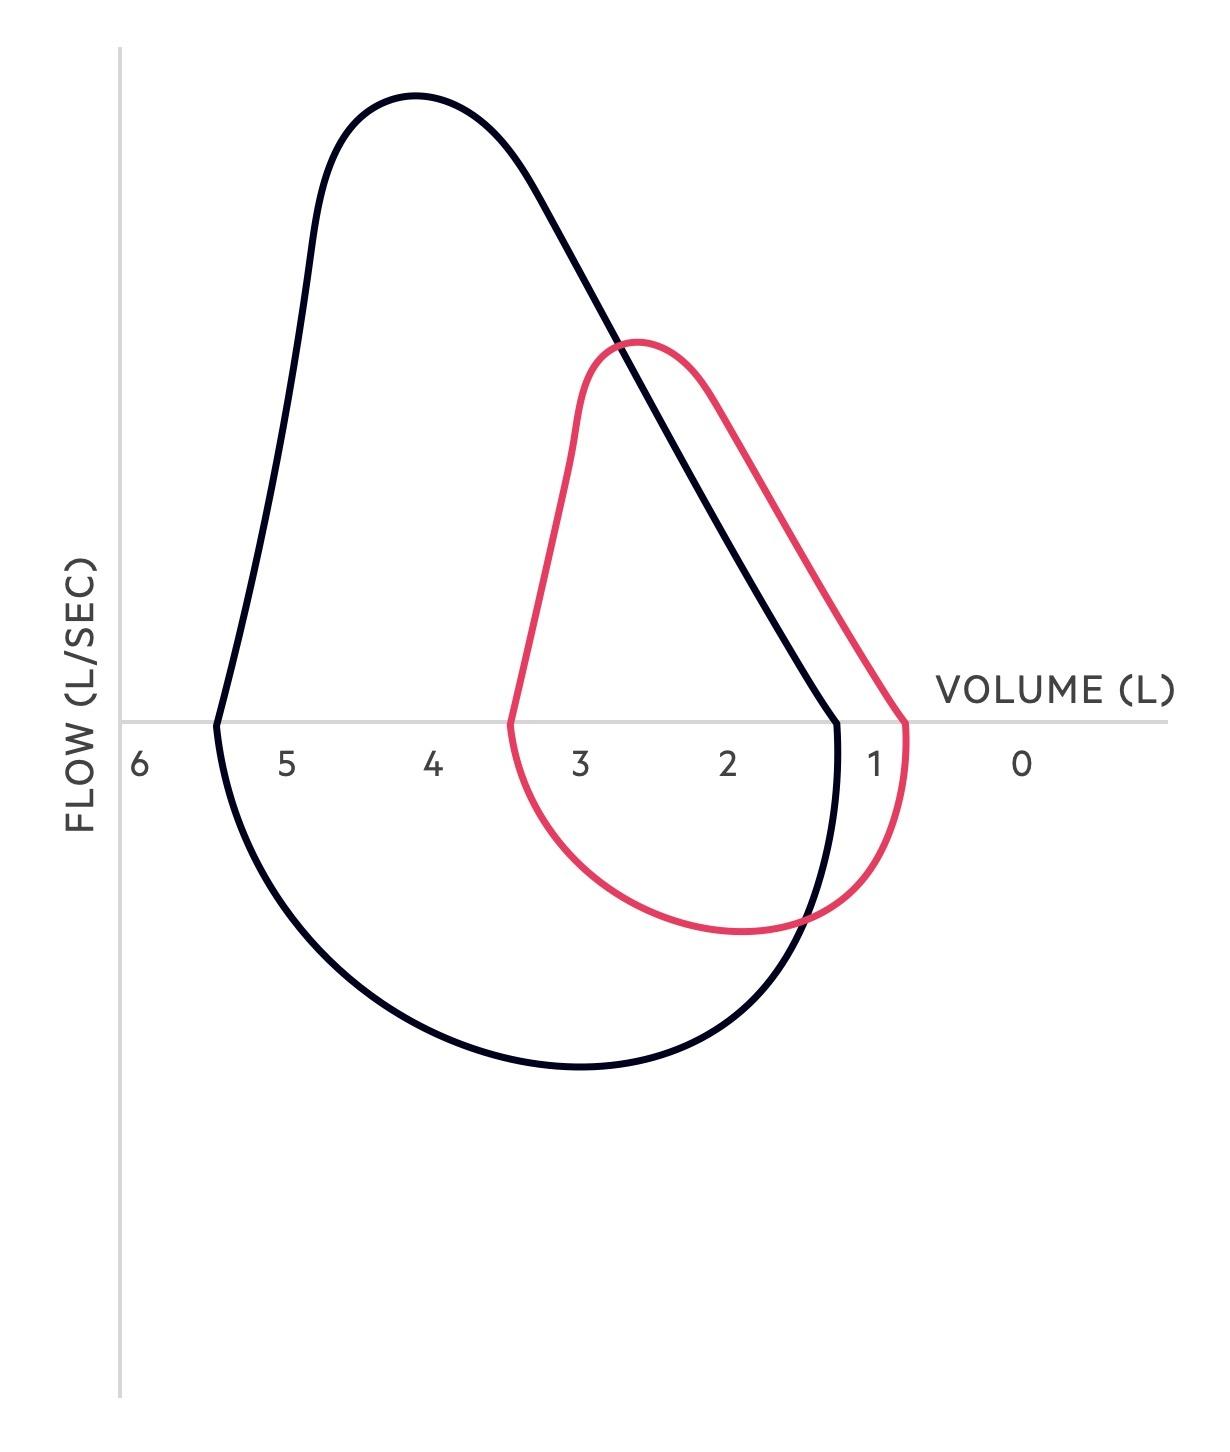 Obstructive flow-volume loop